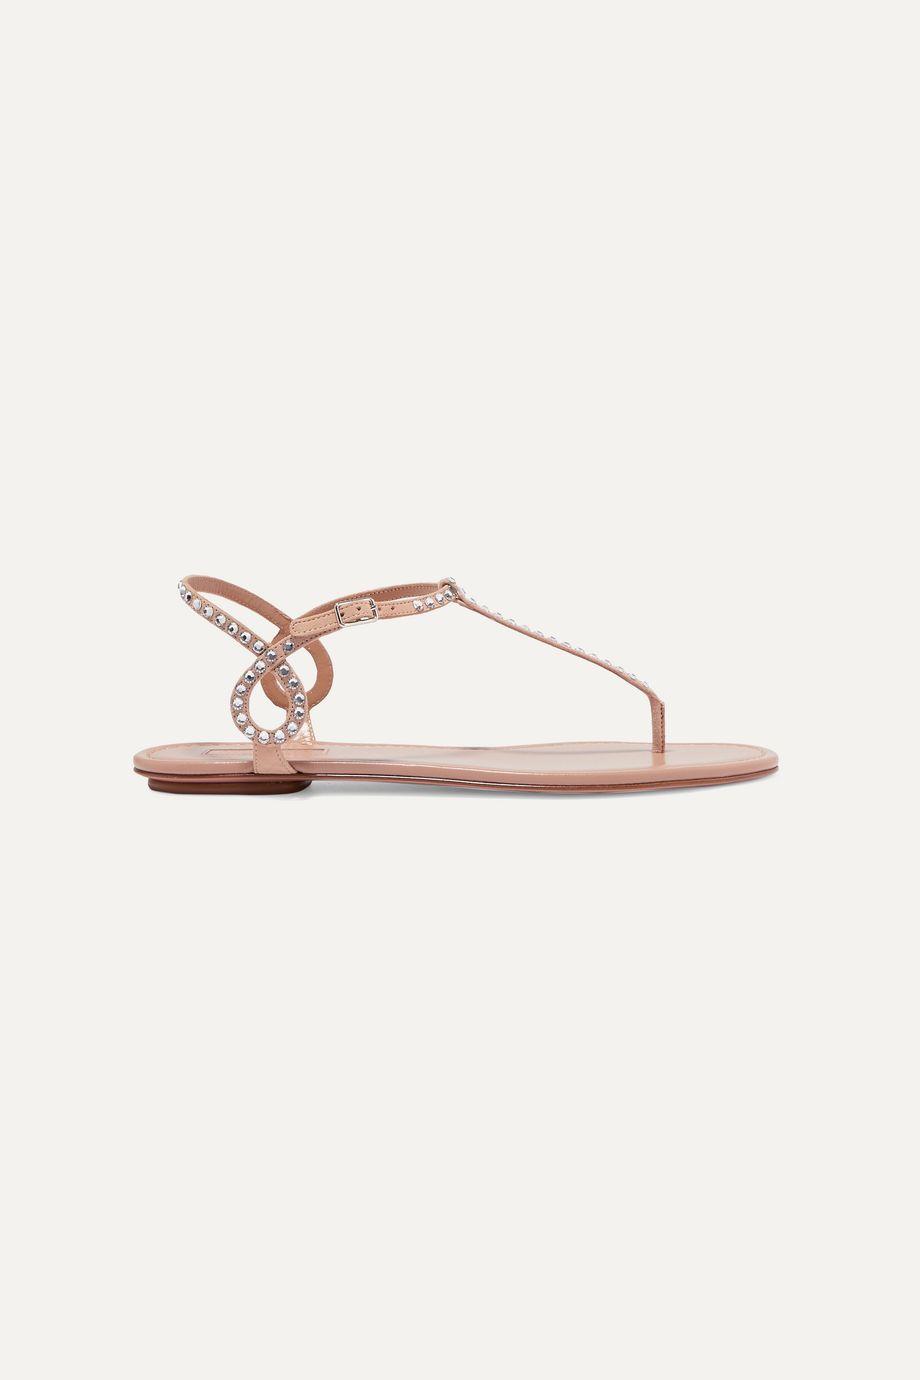 Aquazzura Almost Bare crystal-embellished leather sandals